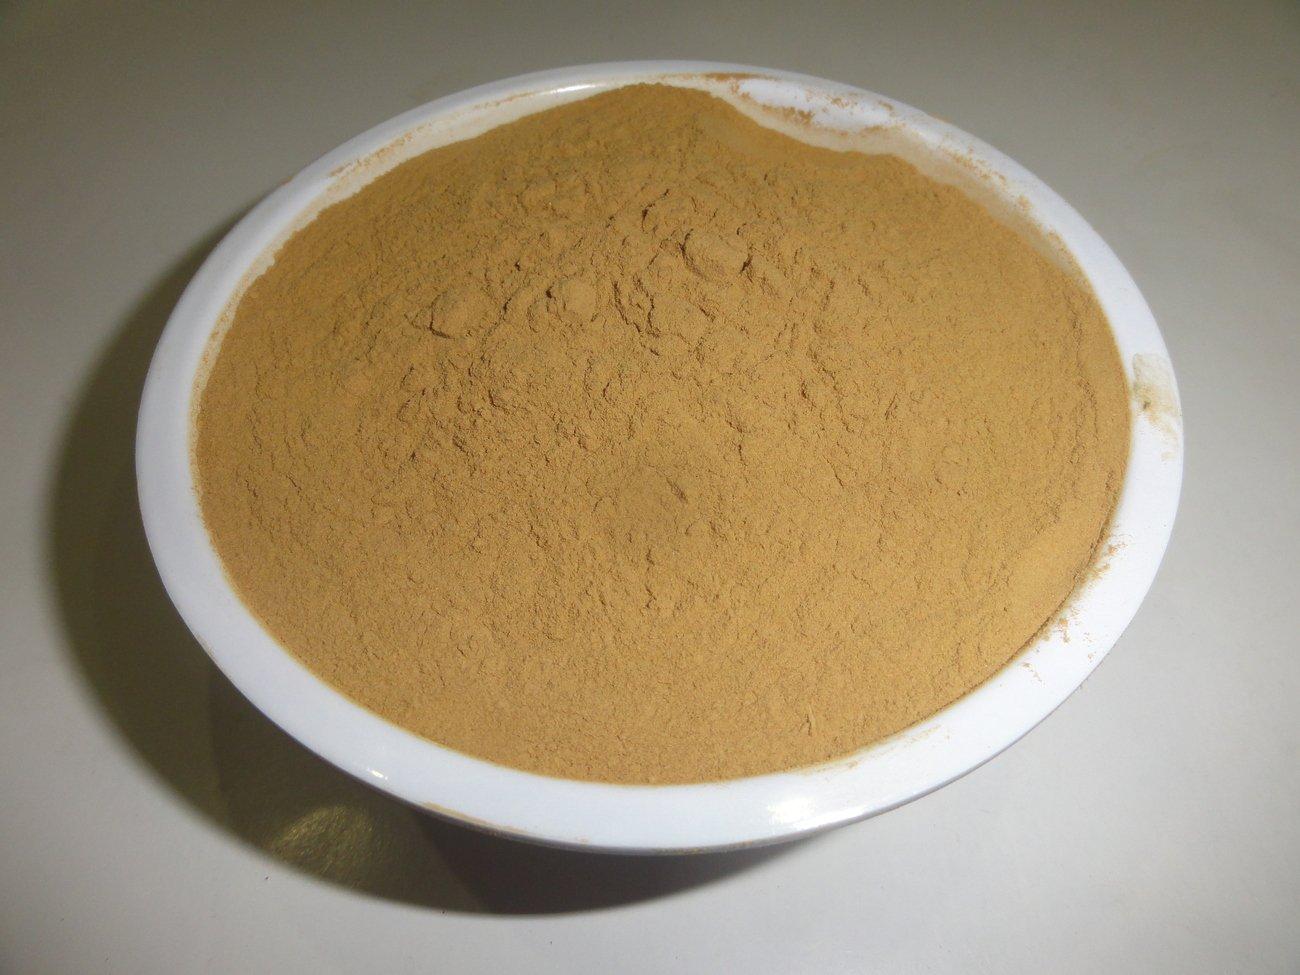 1g Rauwolfia Serpentina 10:1 Extract Powder - Snakeroot Herb Snake Root